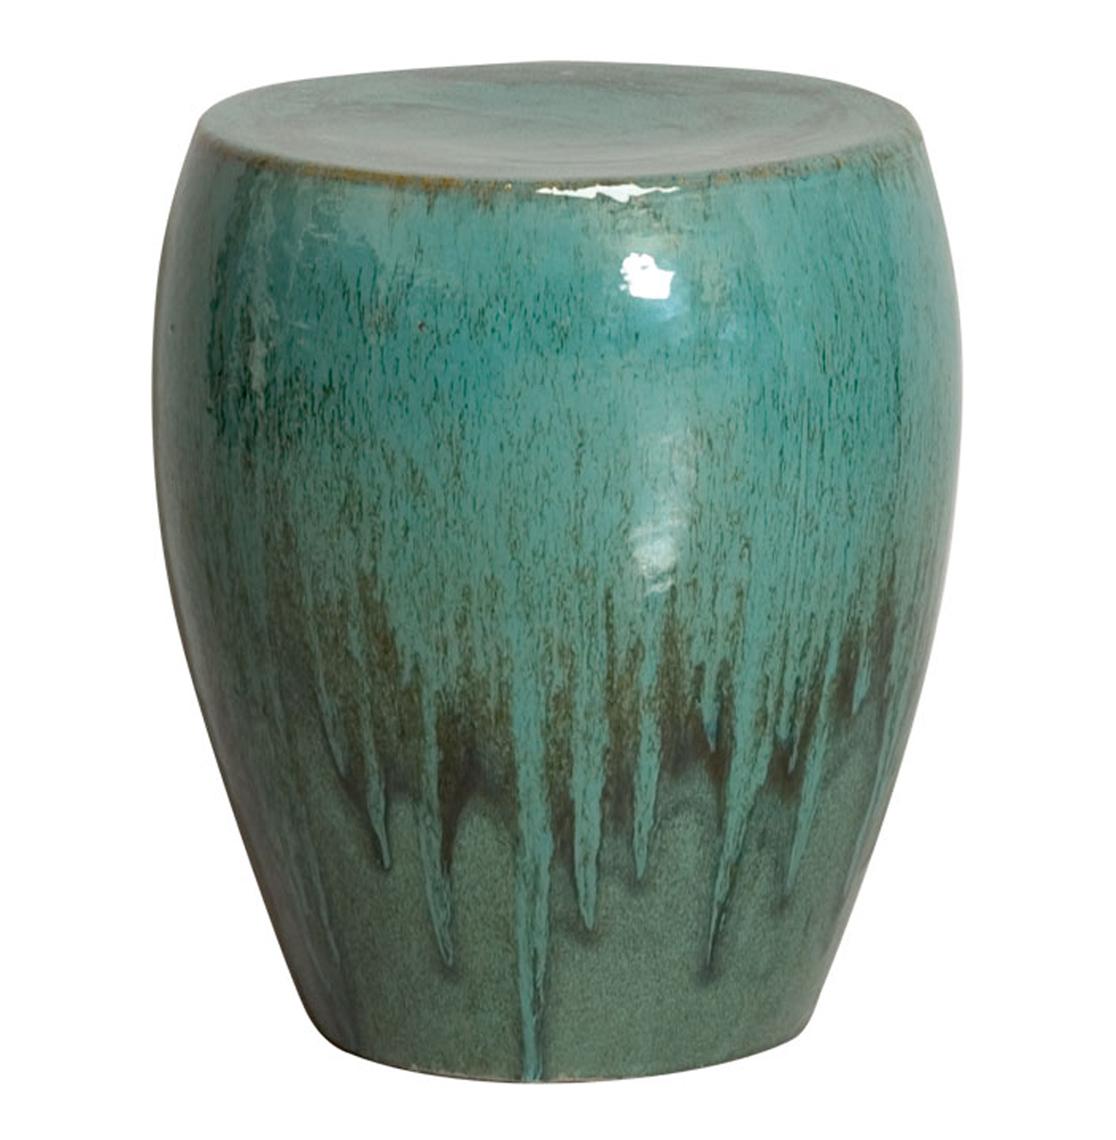 Beau Teal Green Frost Coastal Beach Simple Ceramic Garden Seat Stool